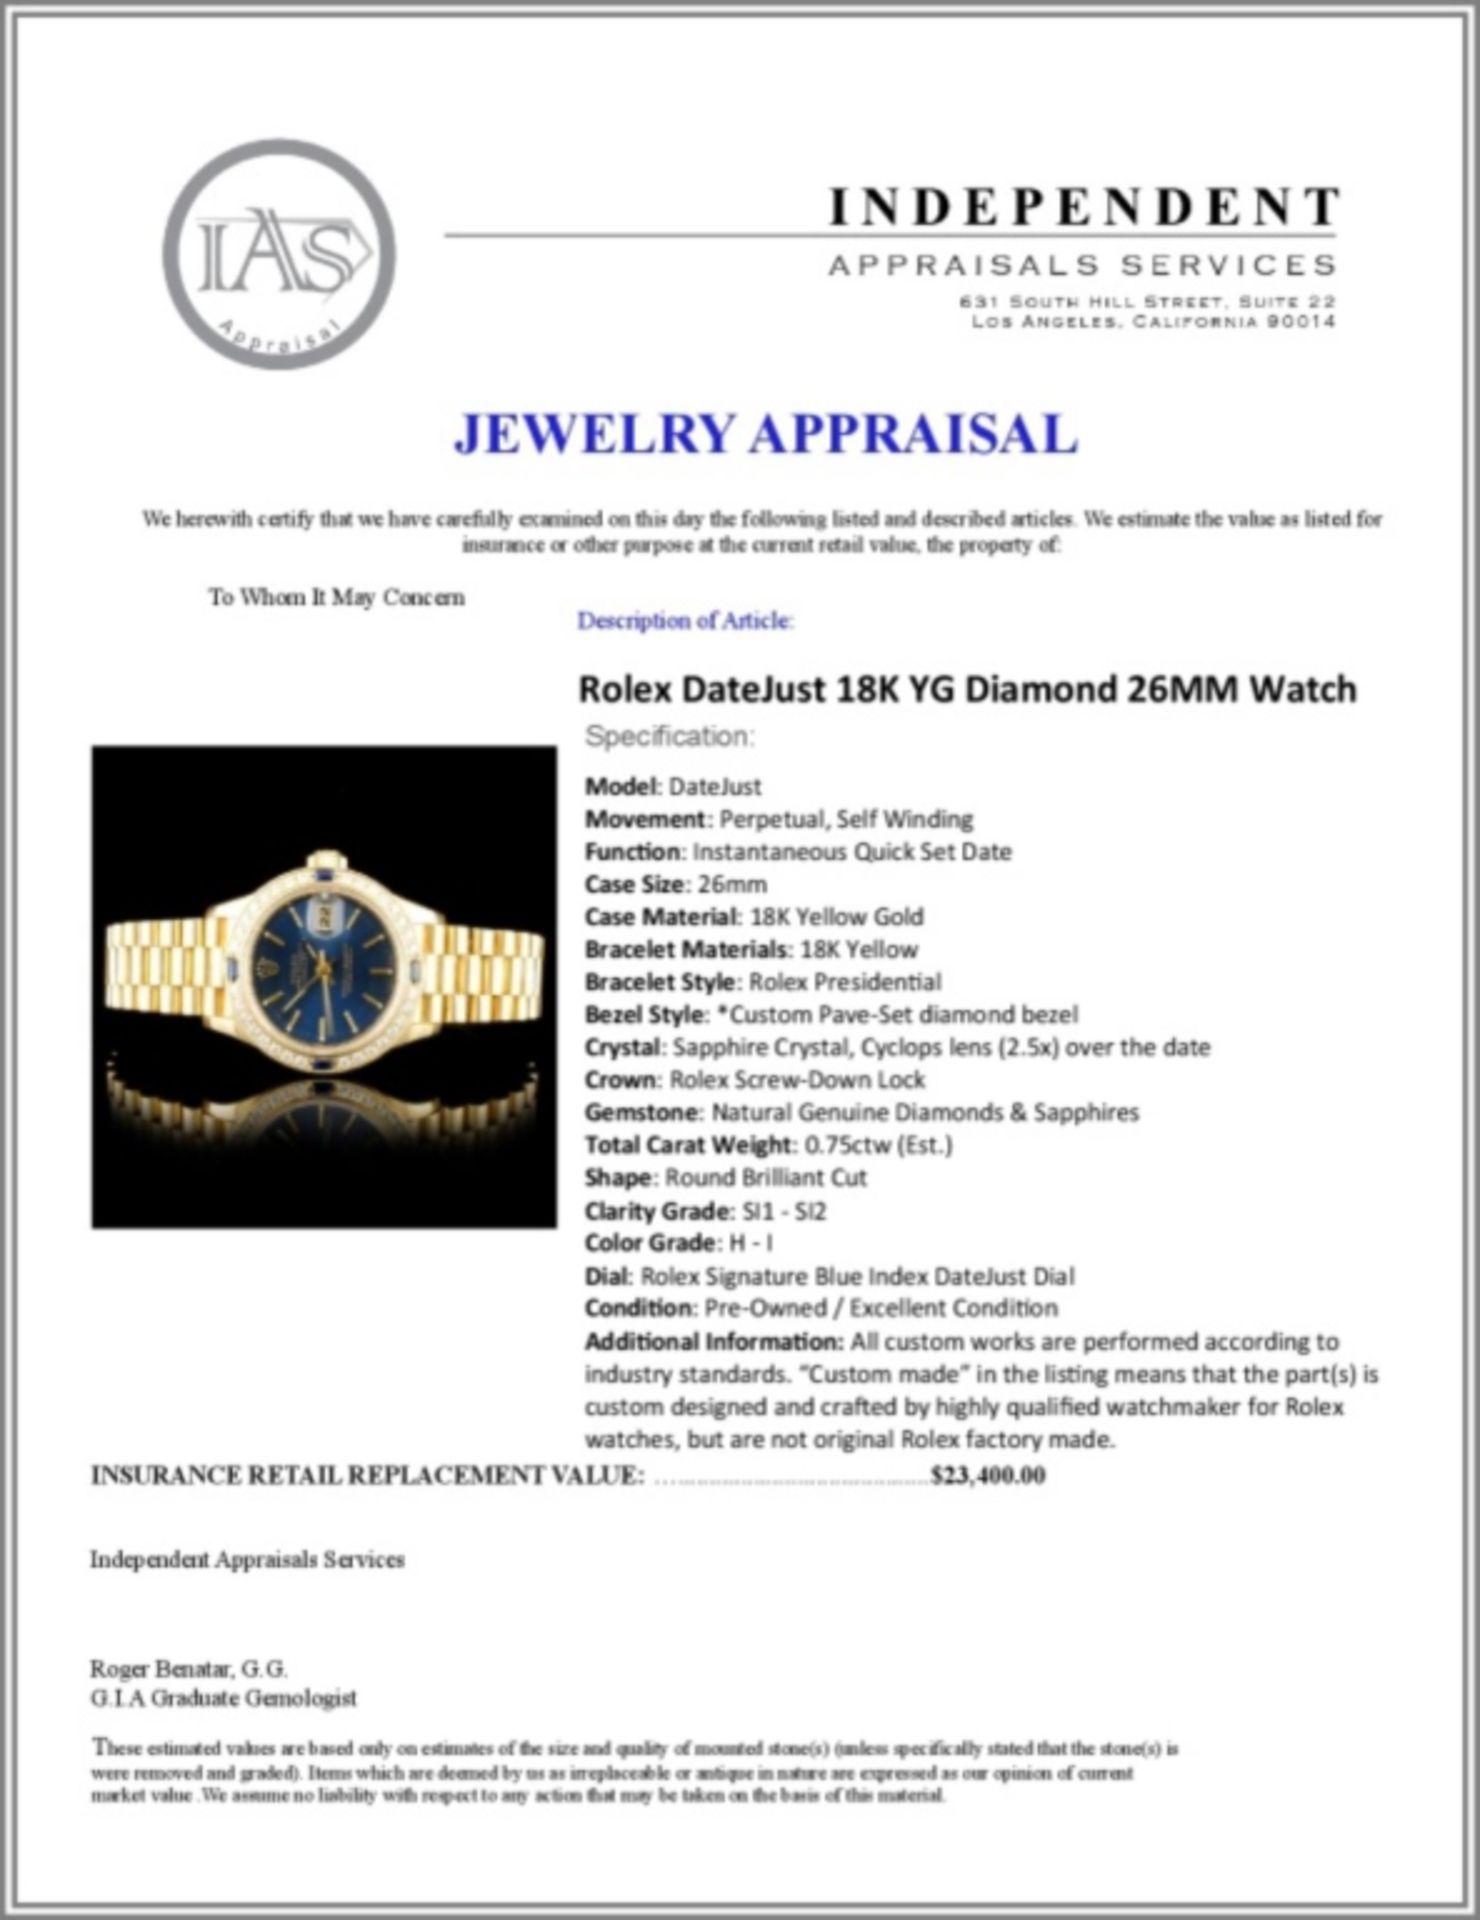 Rolex DateJust 18K YG Diamond 26MM Watch - Image 6 of 6